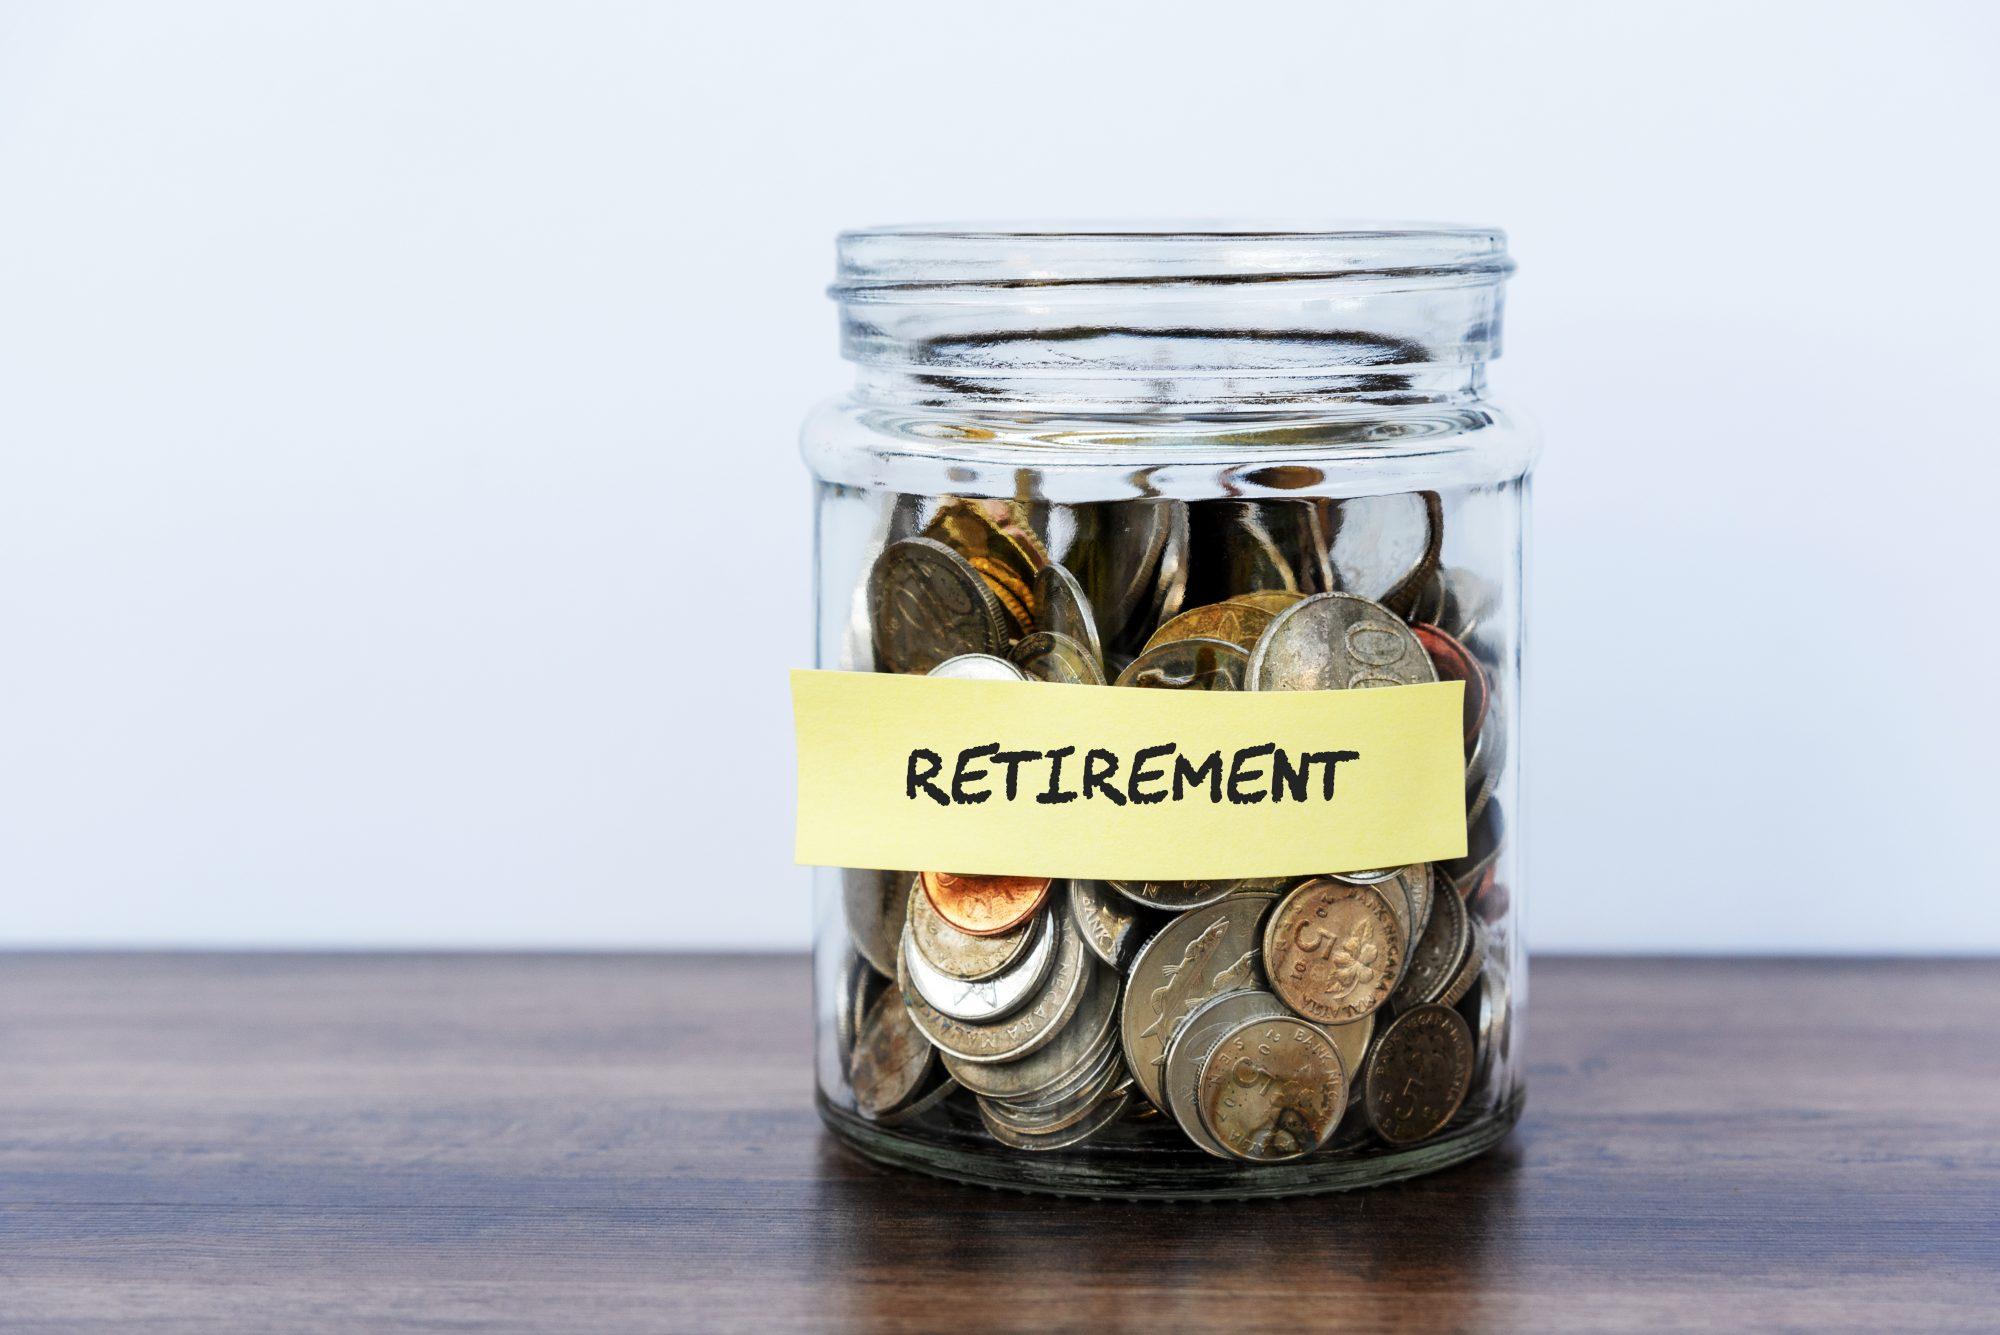 Retiremnet money